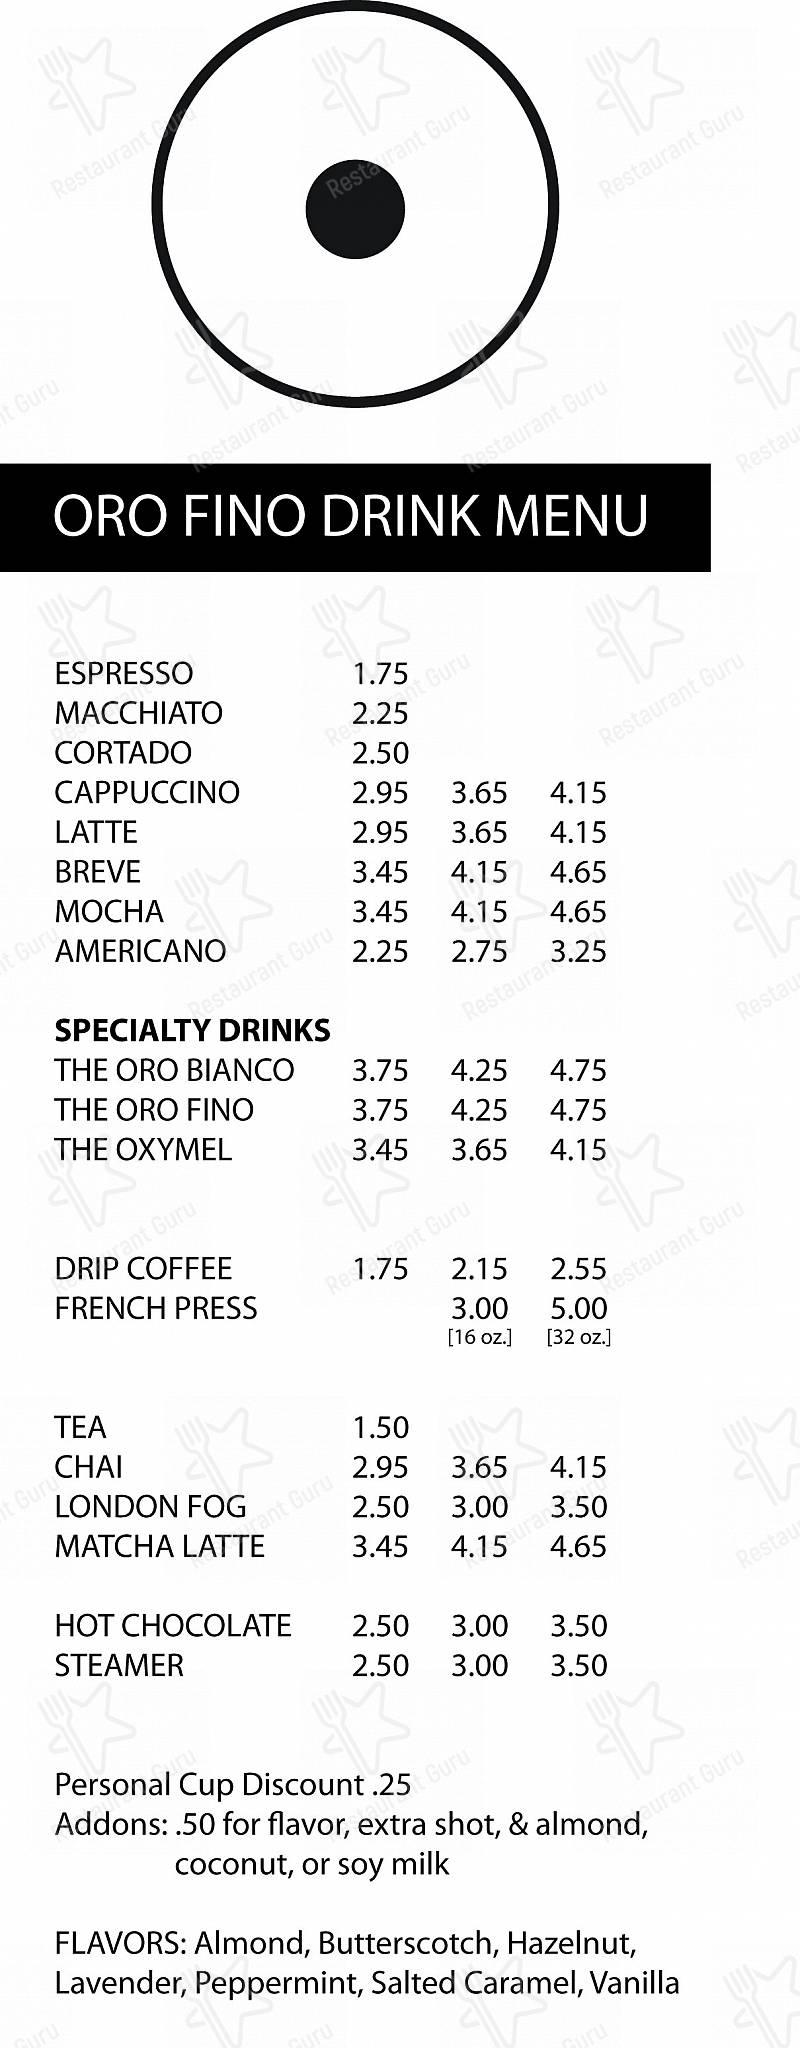 Oro Fino Coffee menu - meals and drinks